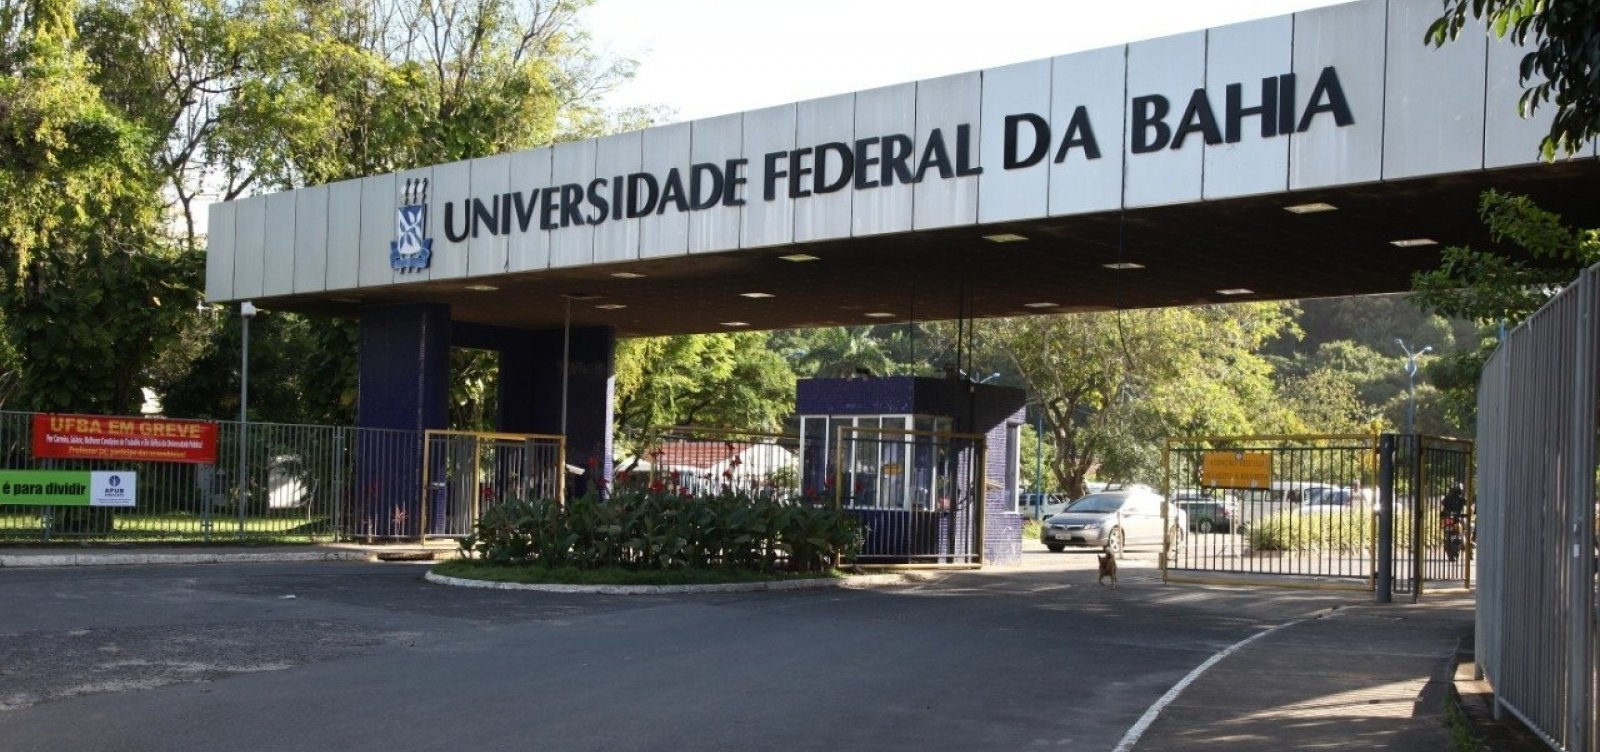 'Balbúrdia vai continuar', defende núcleo de pesquisa da Ufba após corte de verba